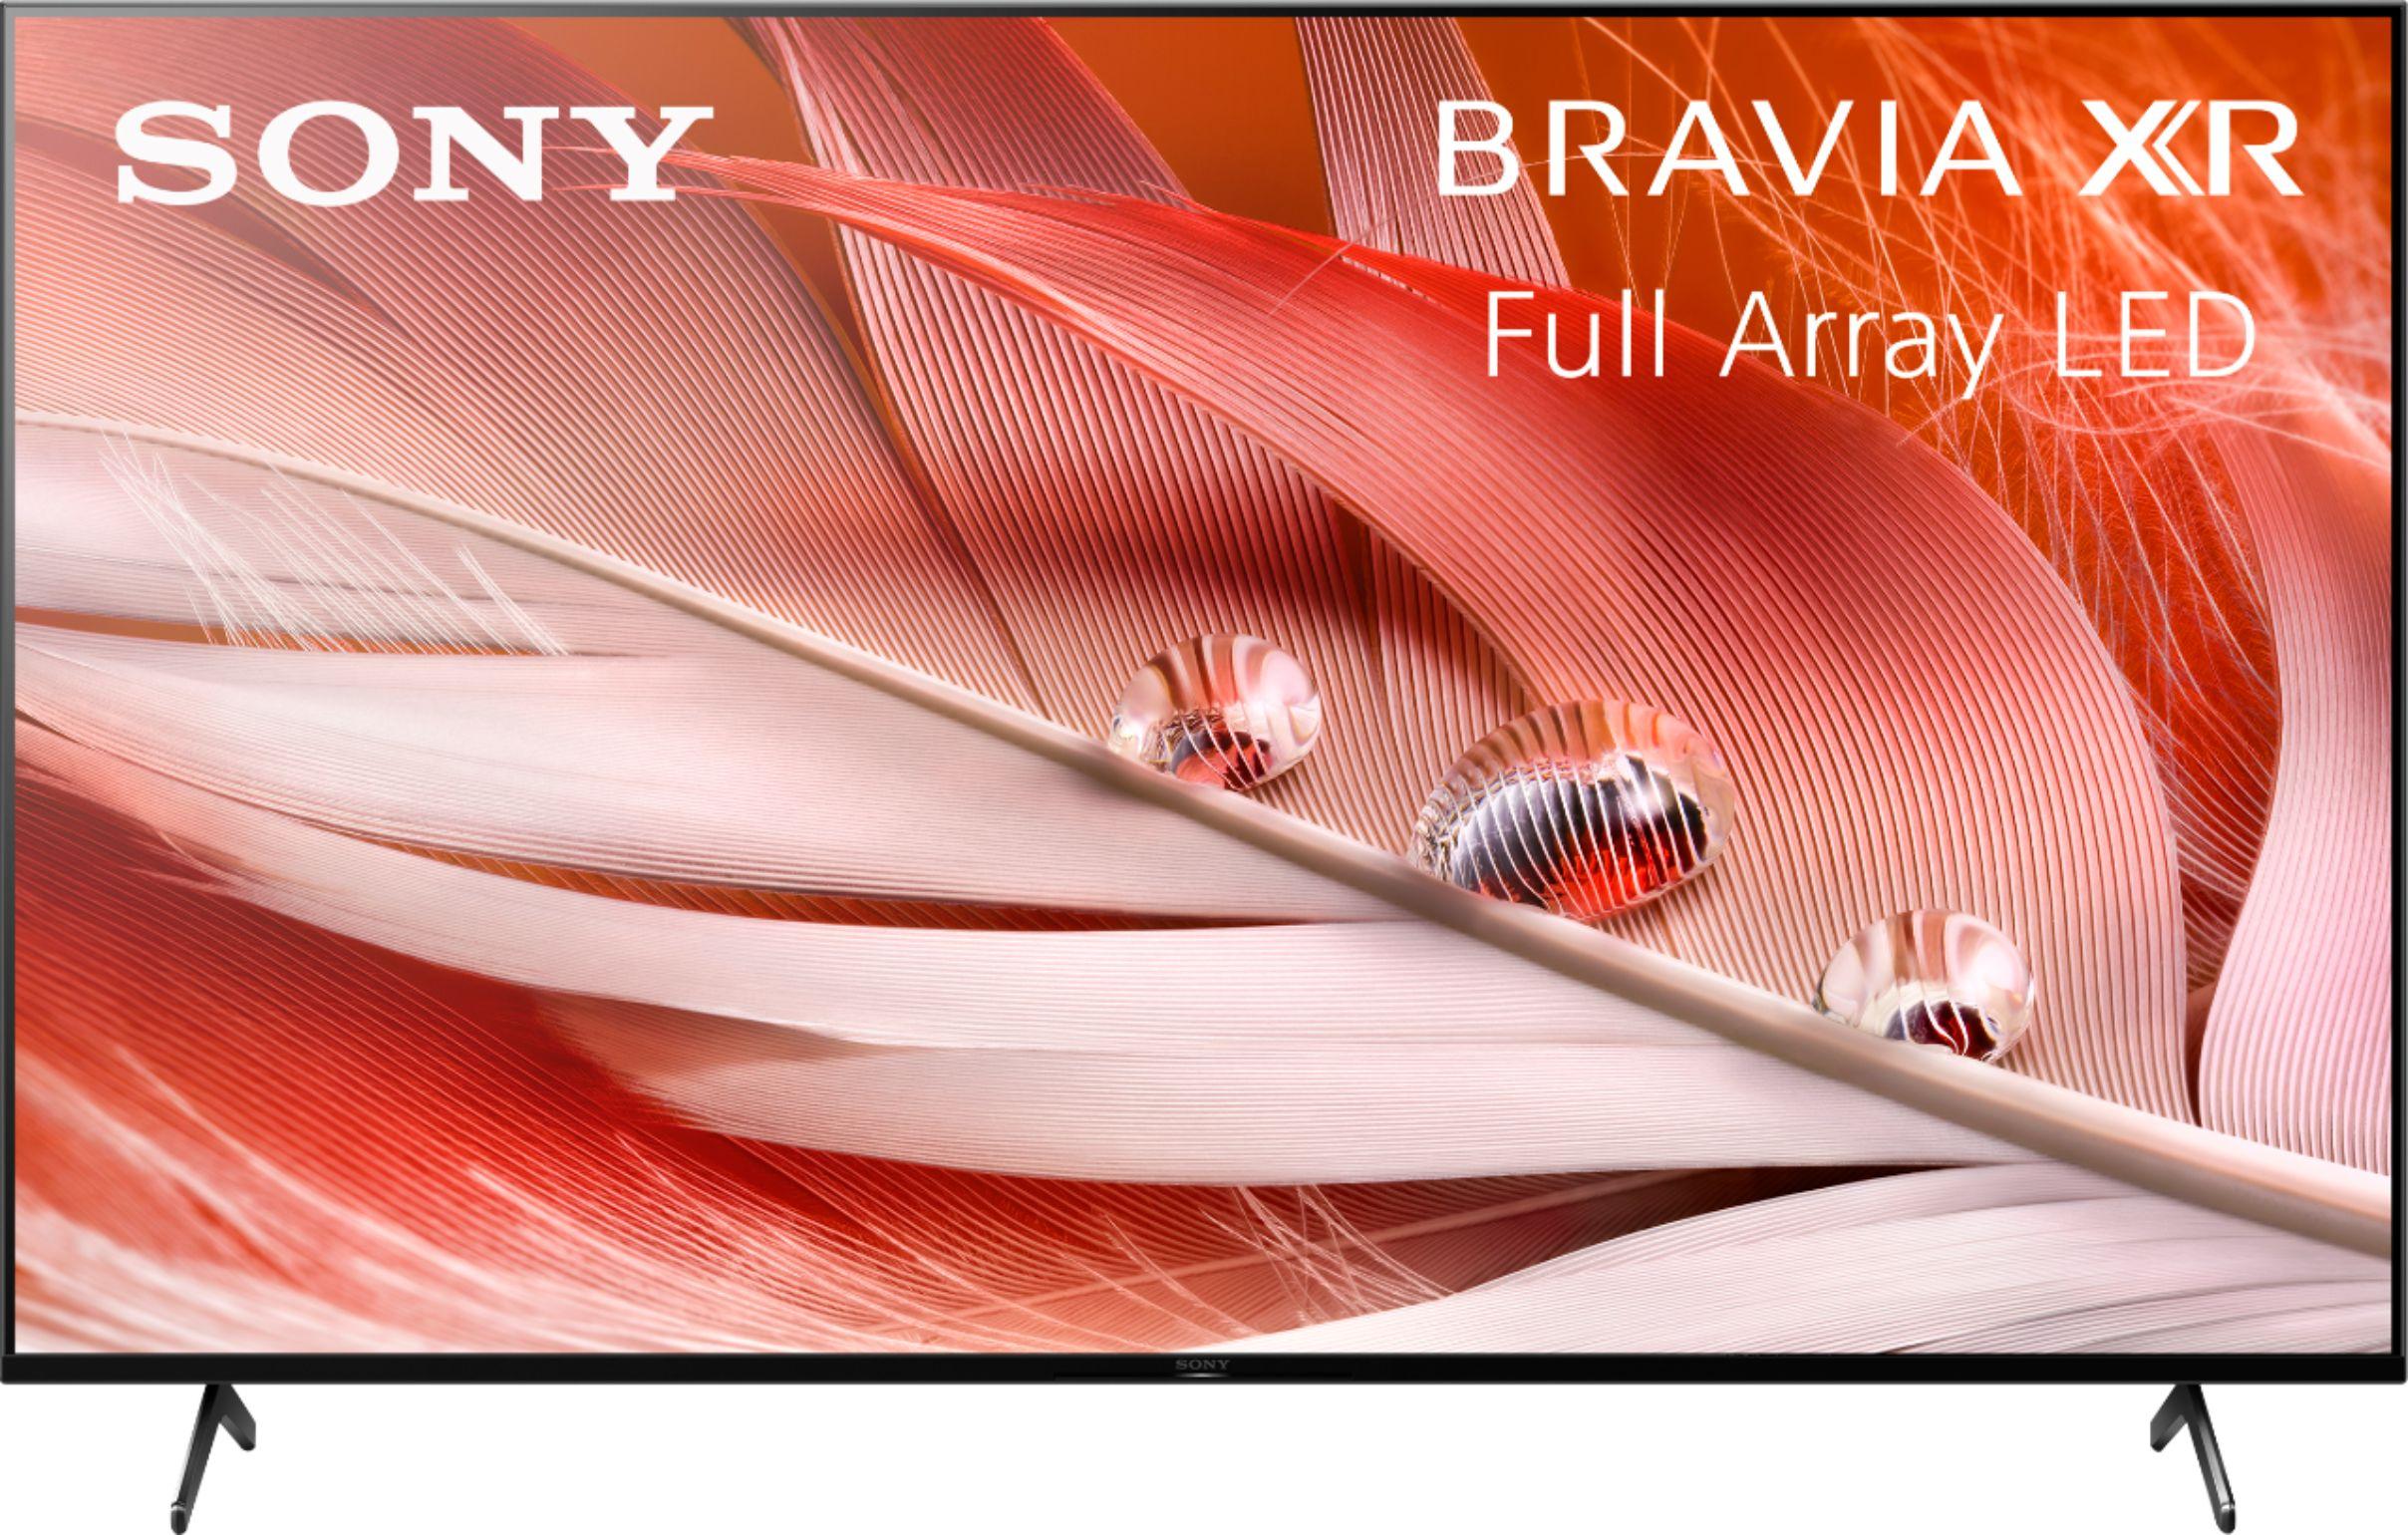 "Sony - 65"" Class BRAVIA XR X90J Series LED 4K UHD Smart Google TV"